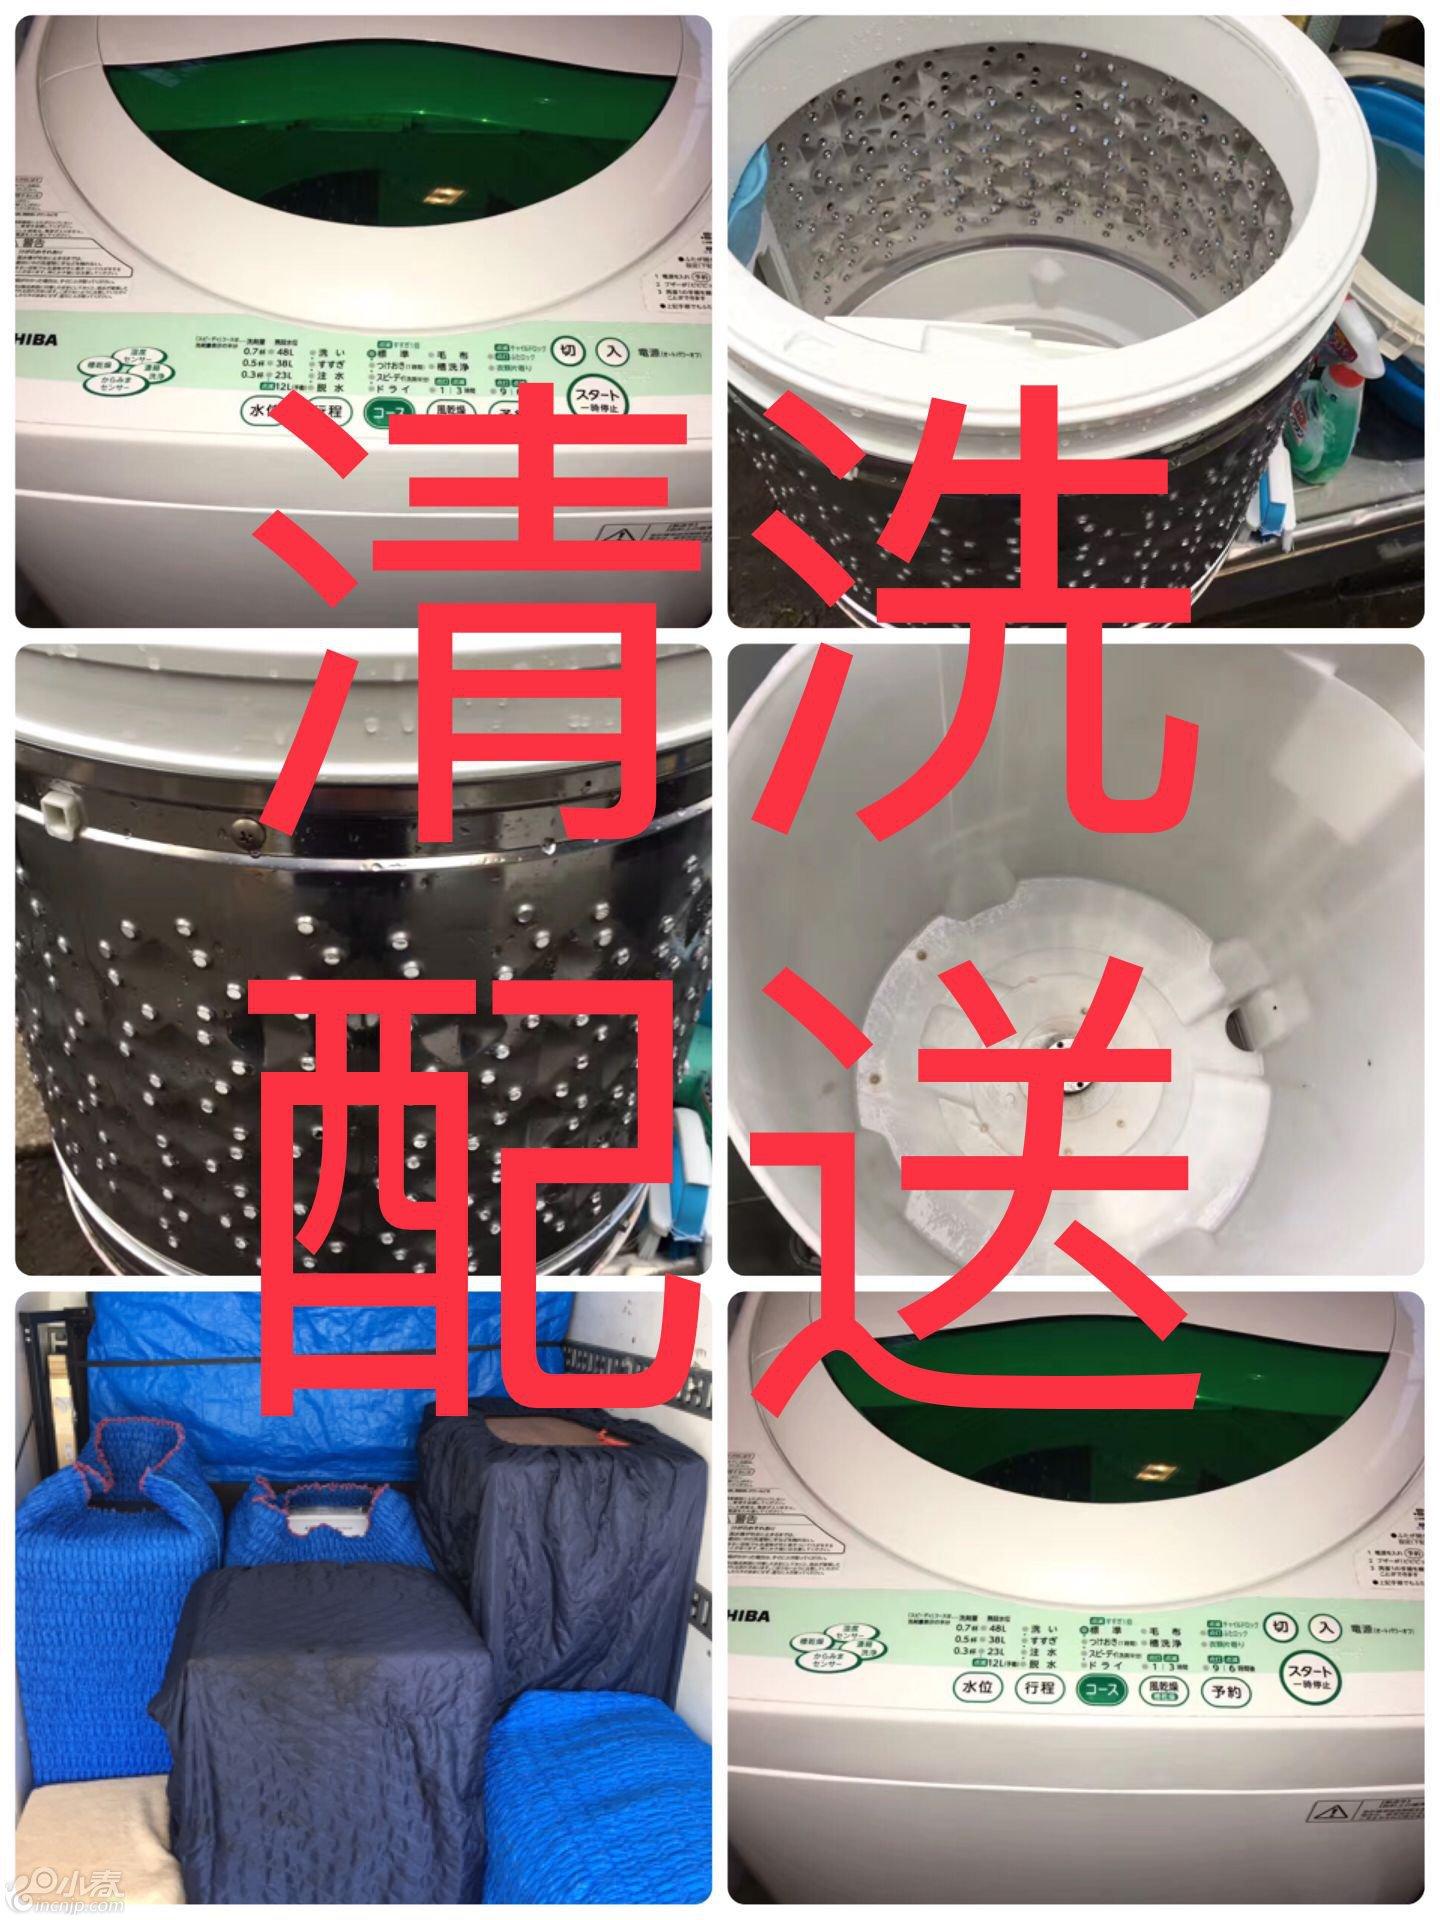 B51AA8C5-91C2-40DC-A838-1848461057A7.jpeg